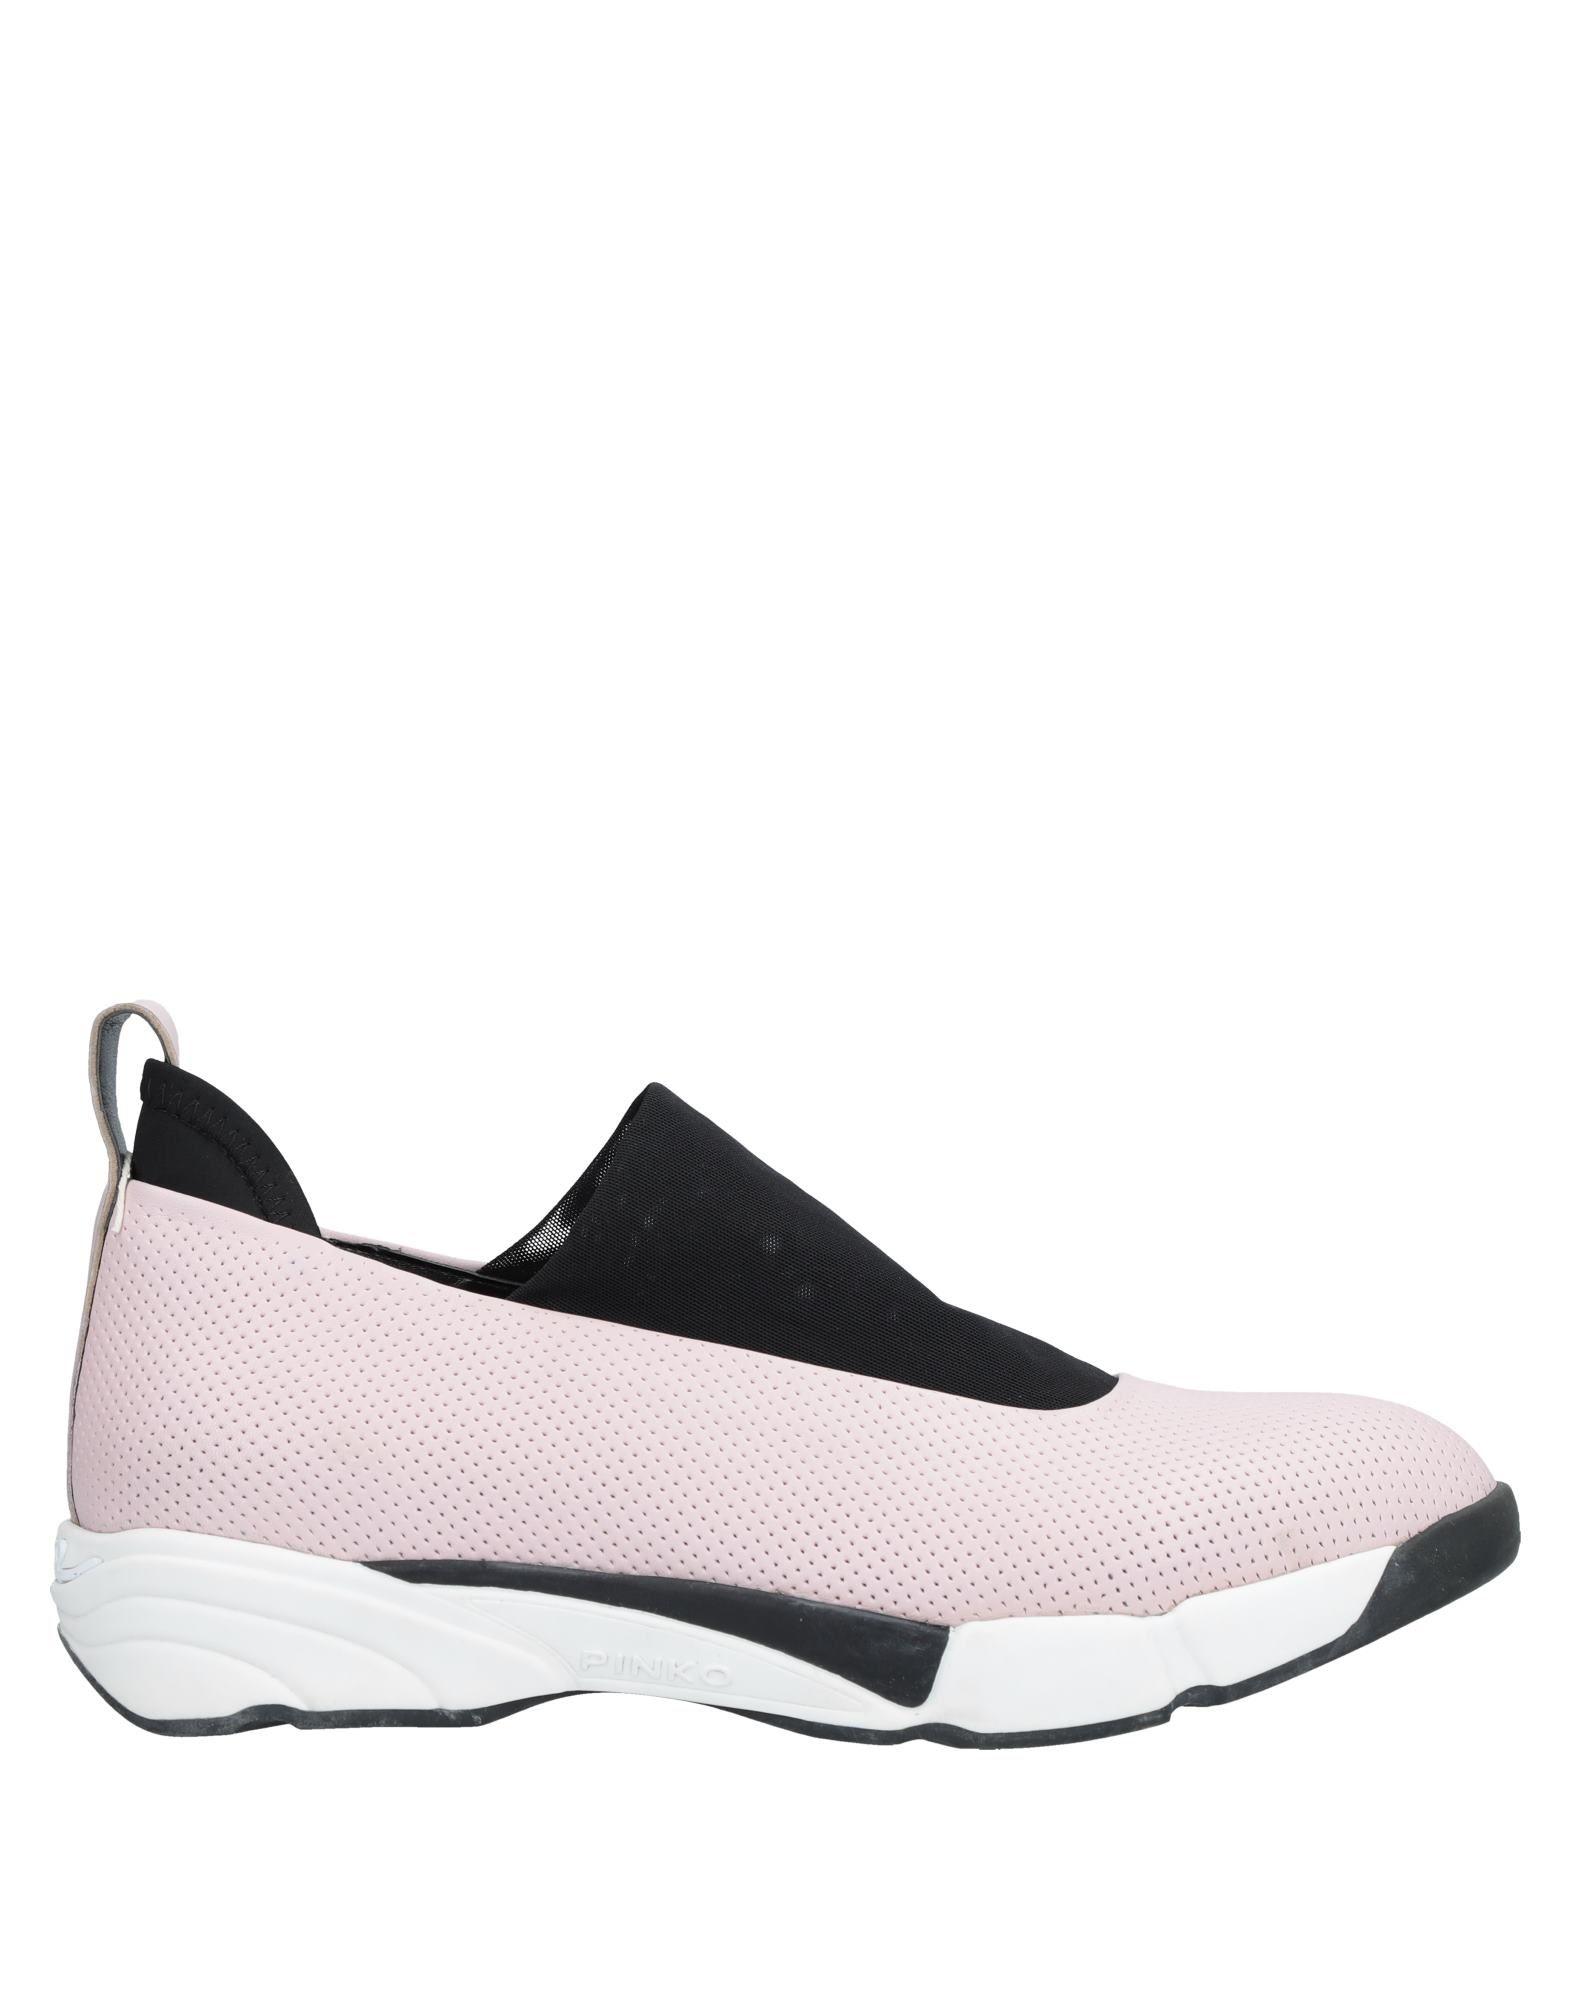 Pinko 11531166ML Sneakers Damen  11531166ML Pinko Gute Qualität beliebte Schuhe eb5972